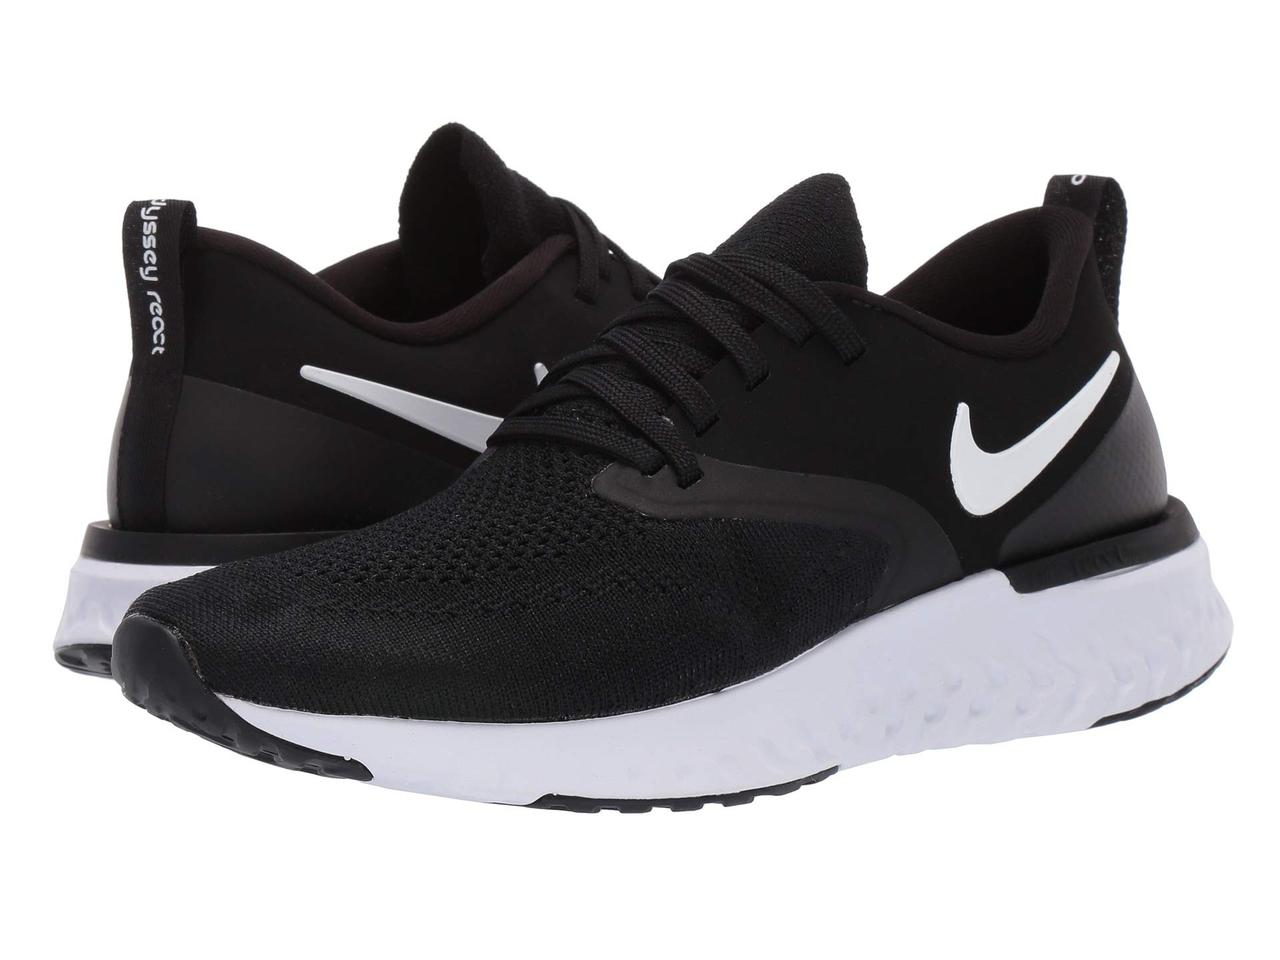 04dd618248d575 Кроссовки/Кеды (Оригинал) Nike Odyssey React Flyknit 2 Black/White - TopUSA